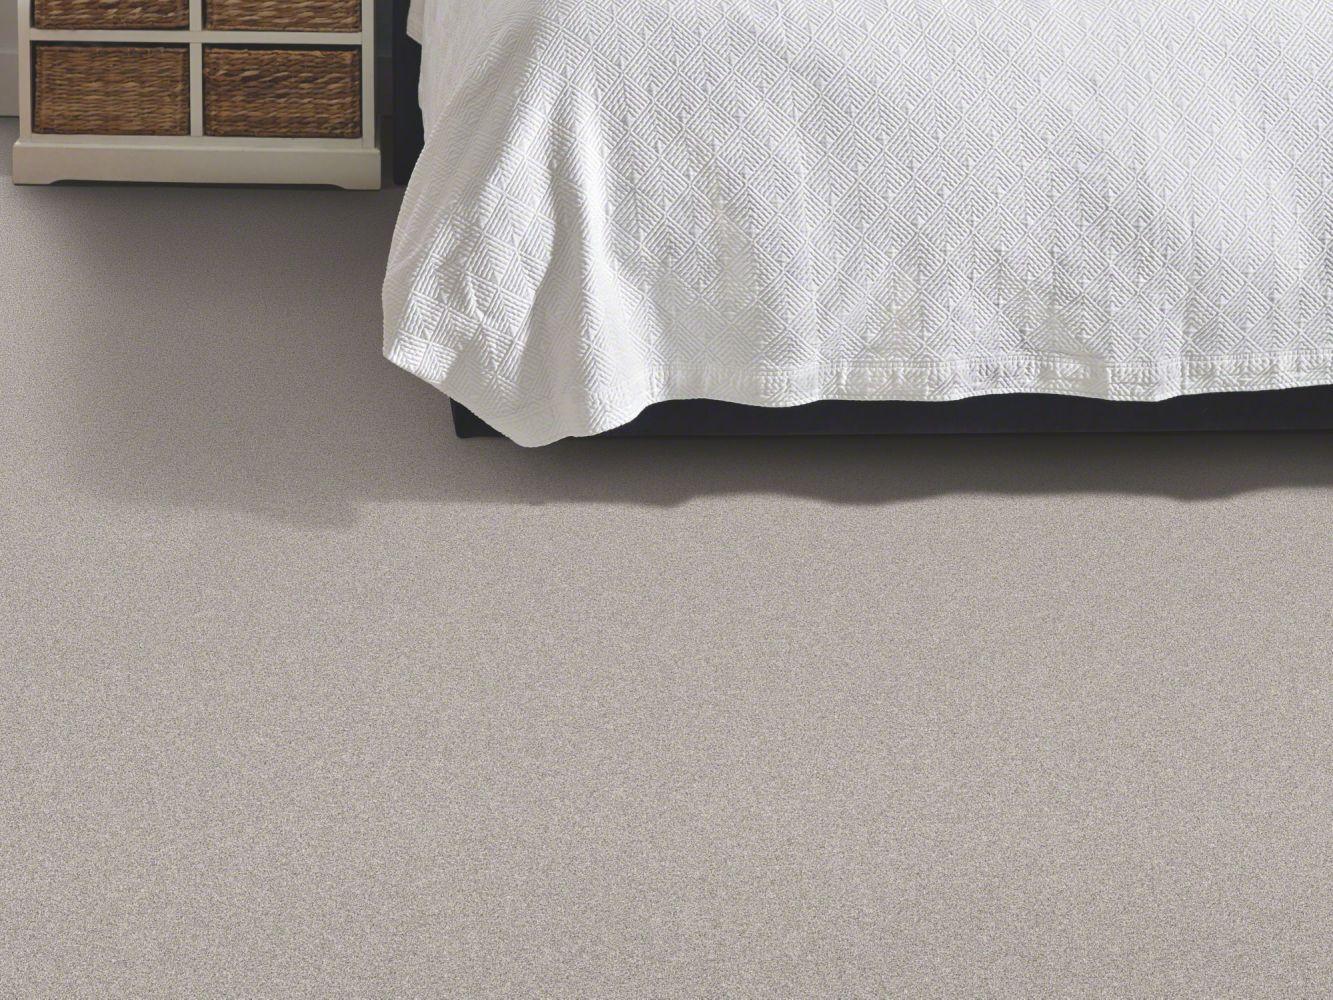 Shaw Floors Value Collections Xz010 Net Stone Path 00503_XZ010